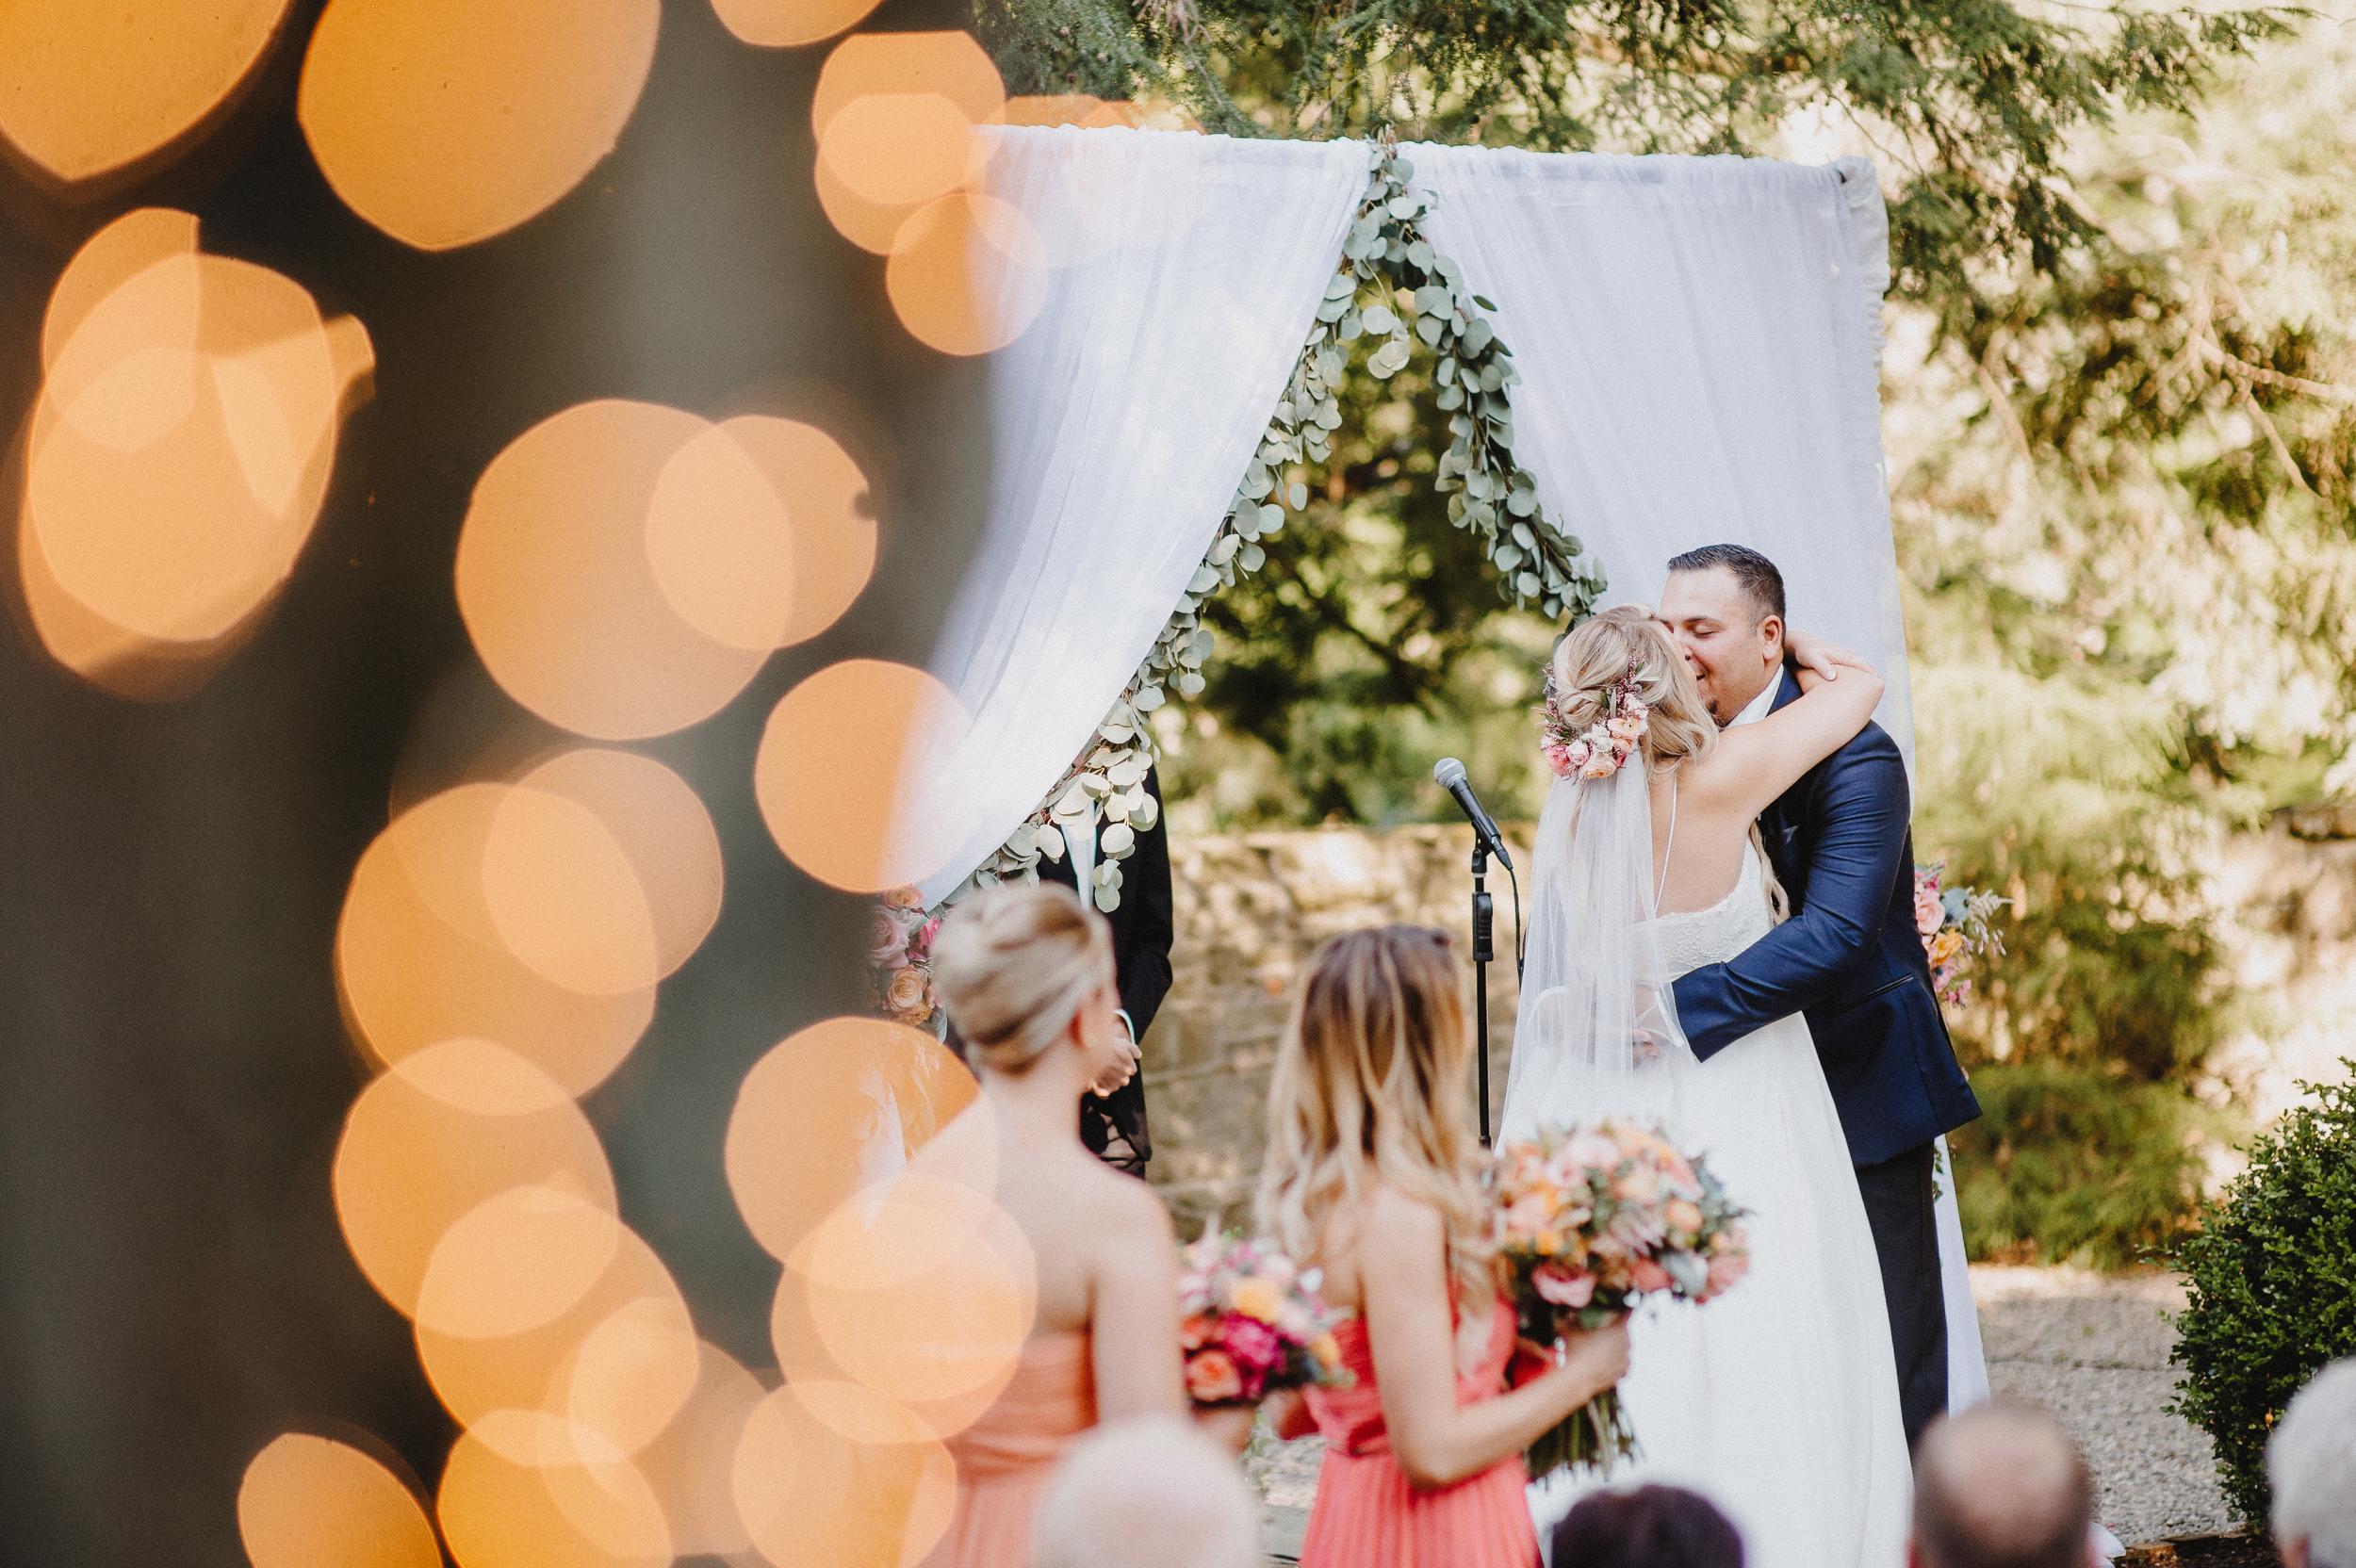 holly-hedge-estate-wedding-photographer-pat-robinson-photography-63.jpg